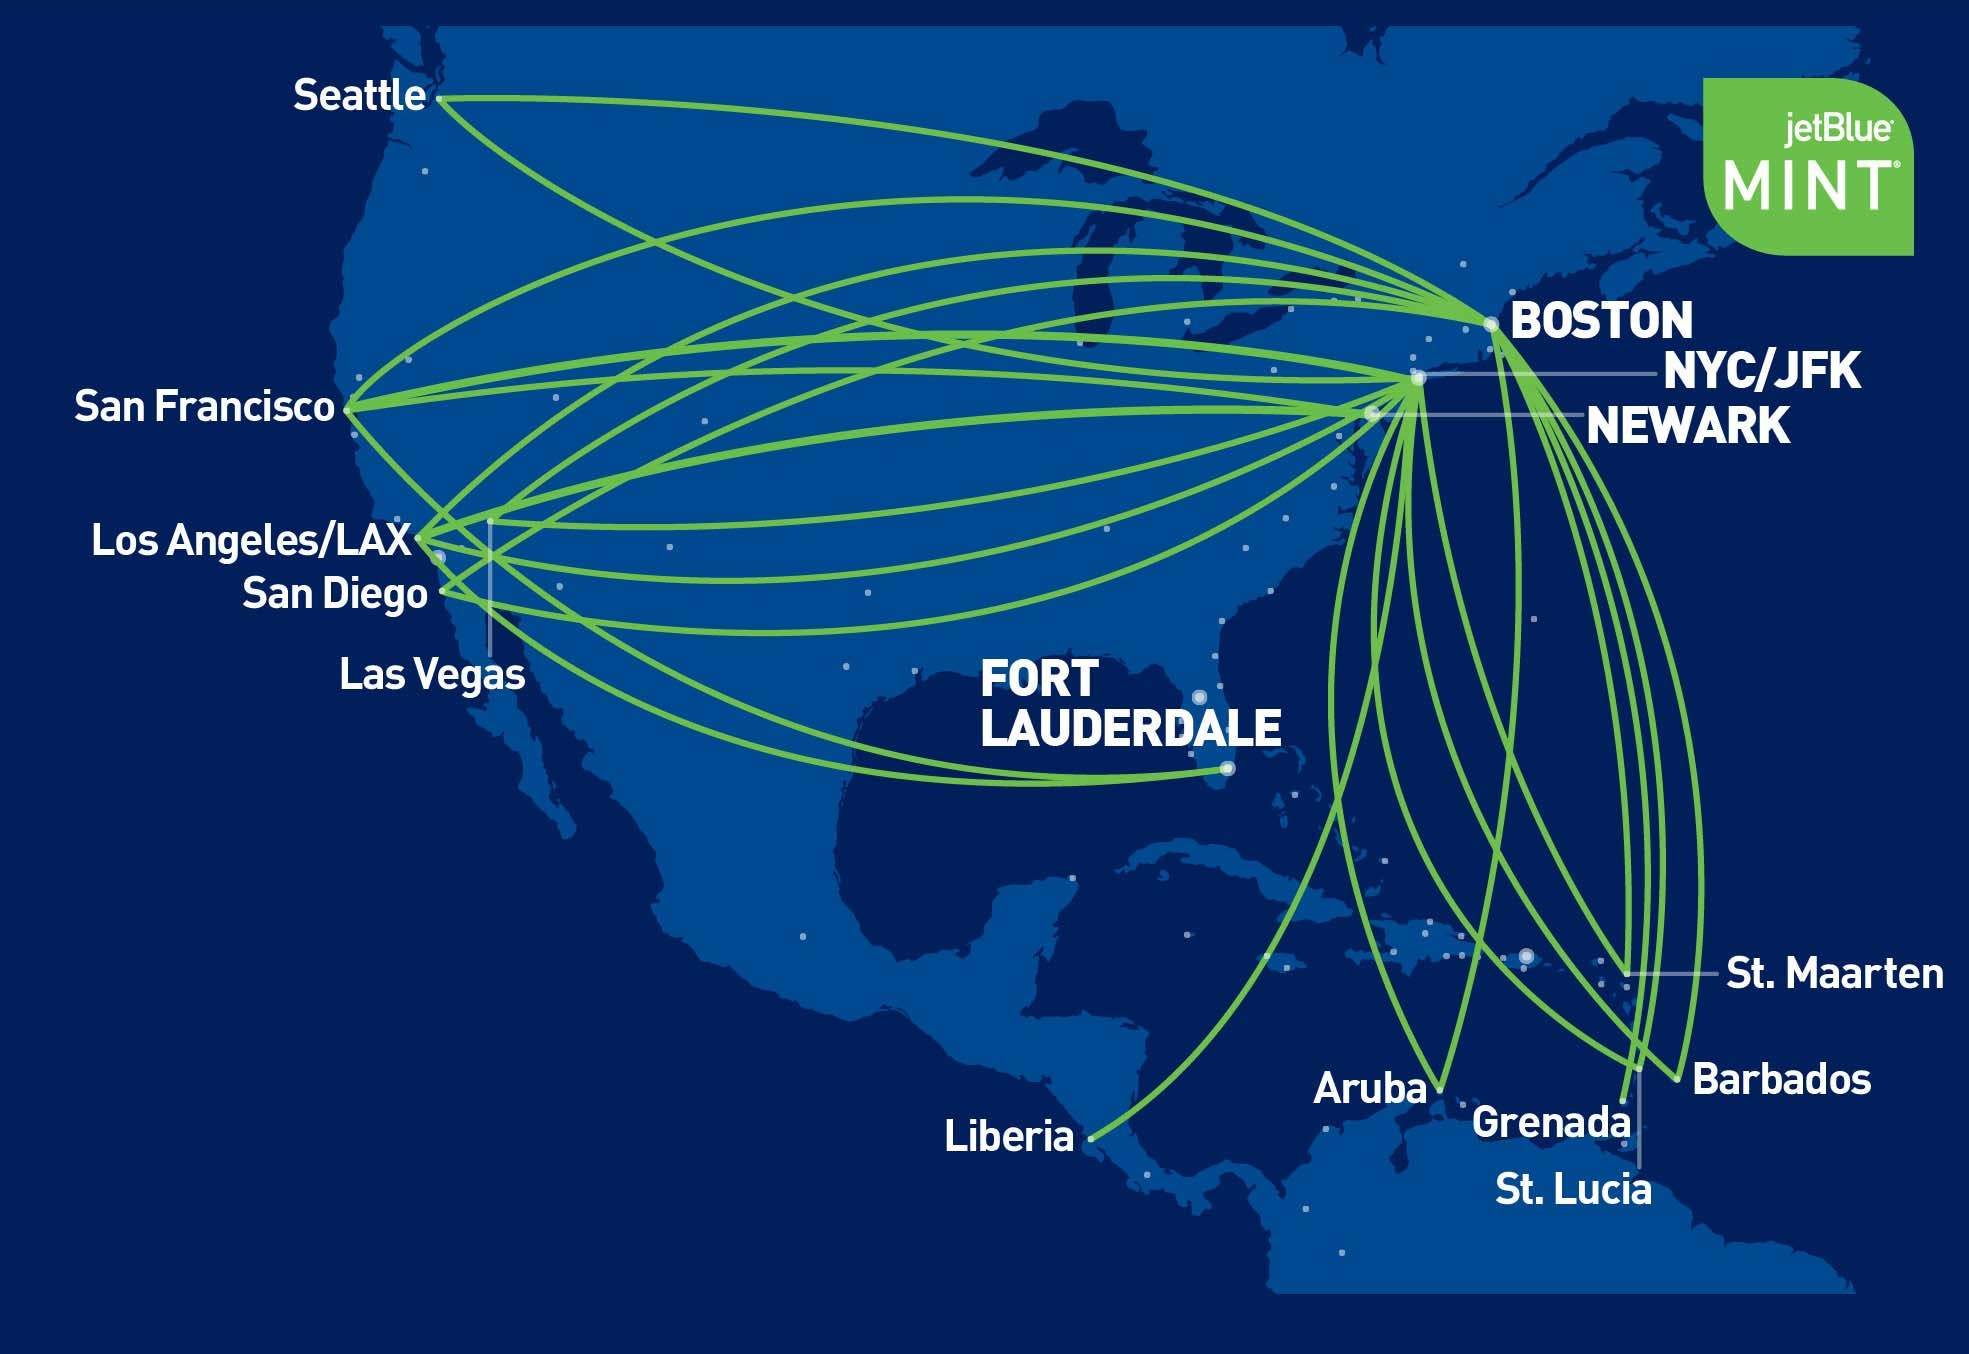 graphic of JetBlue Mint routes